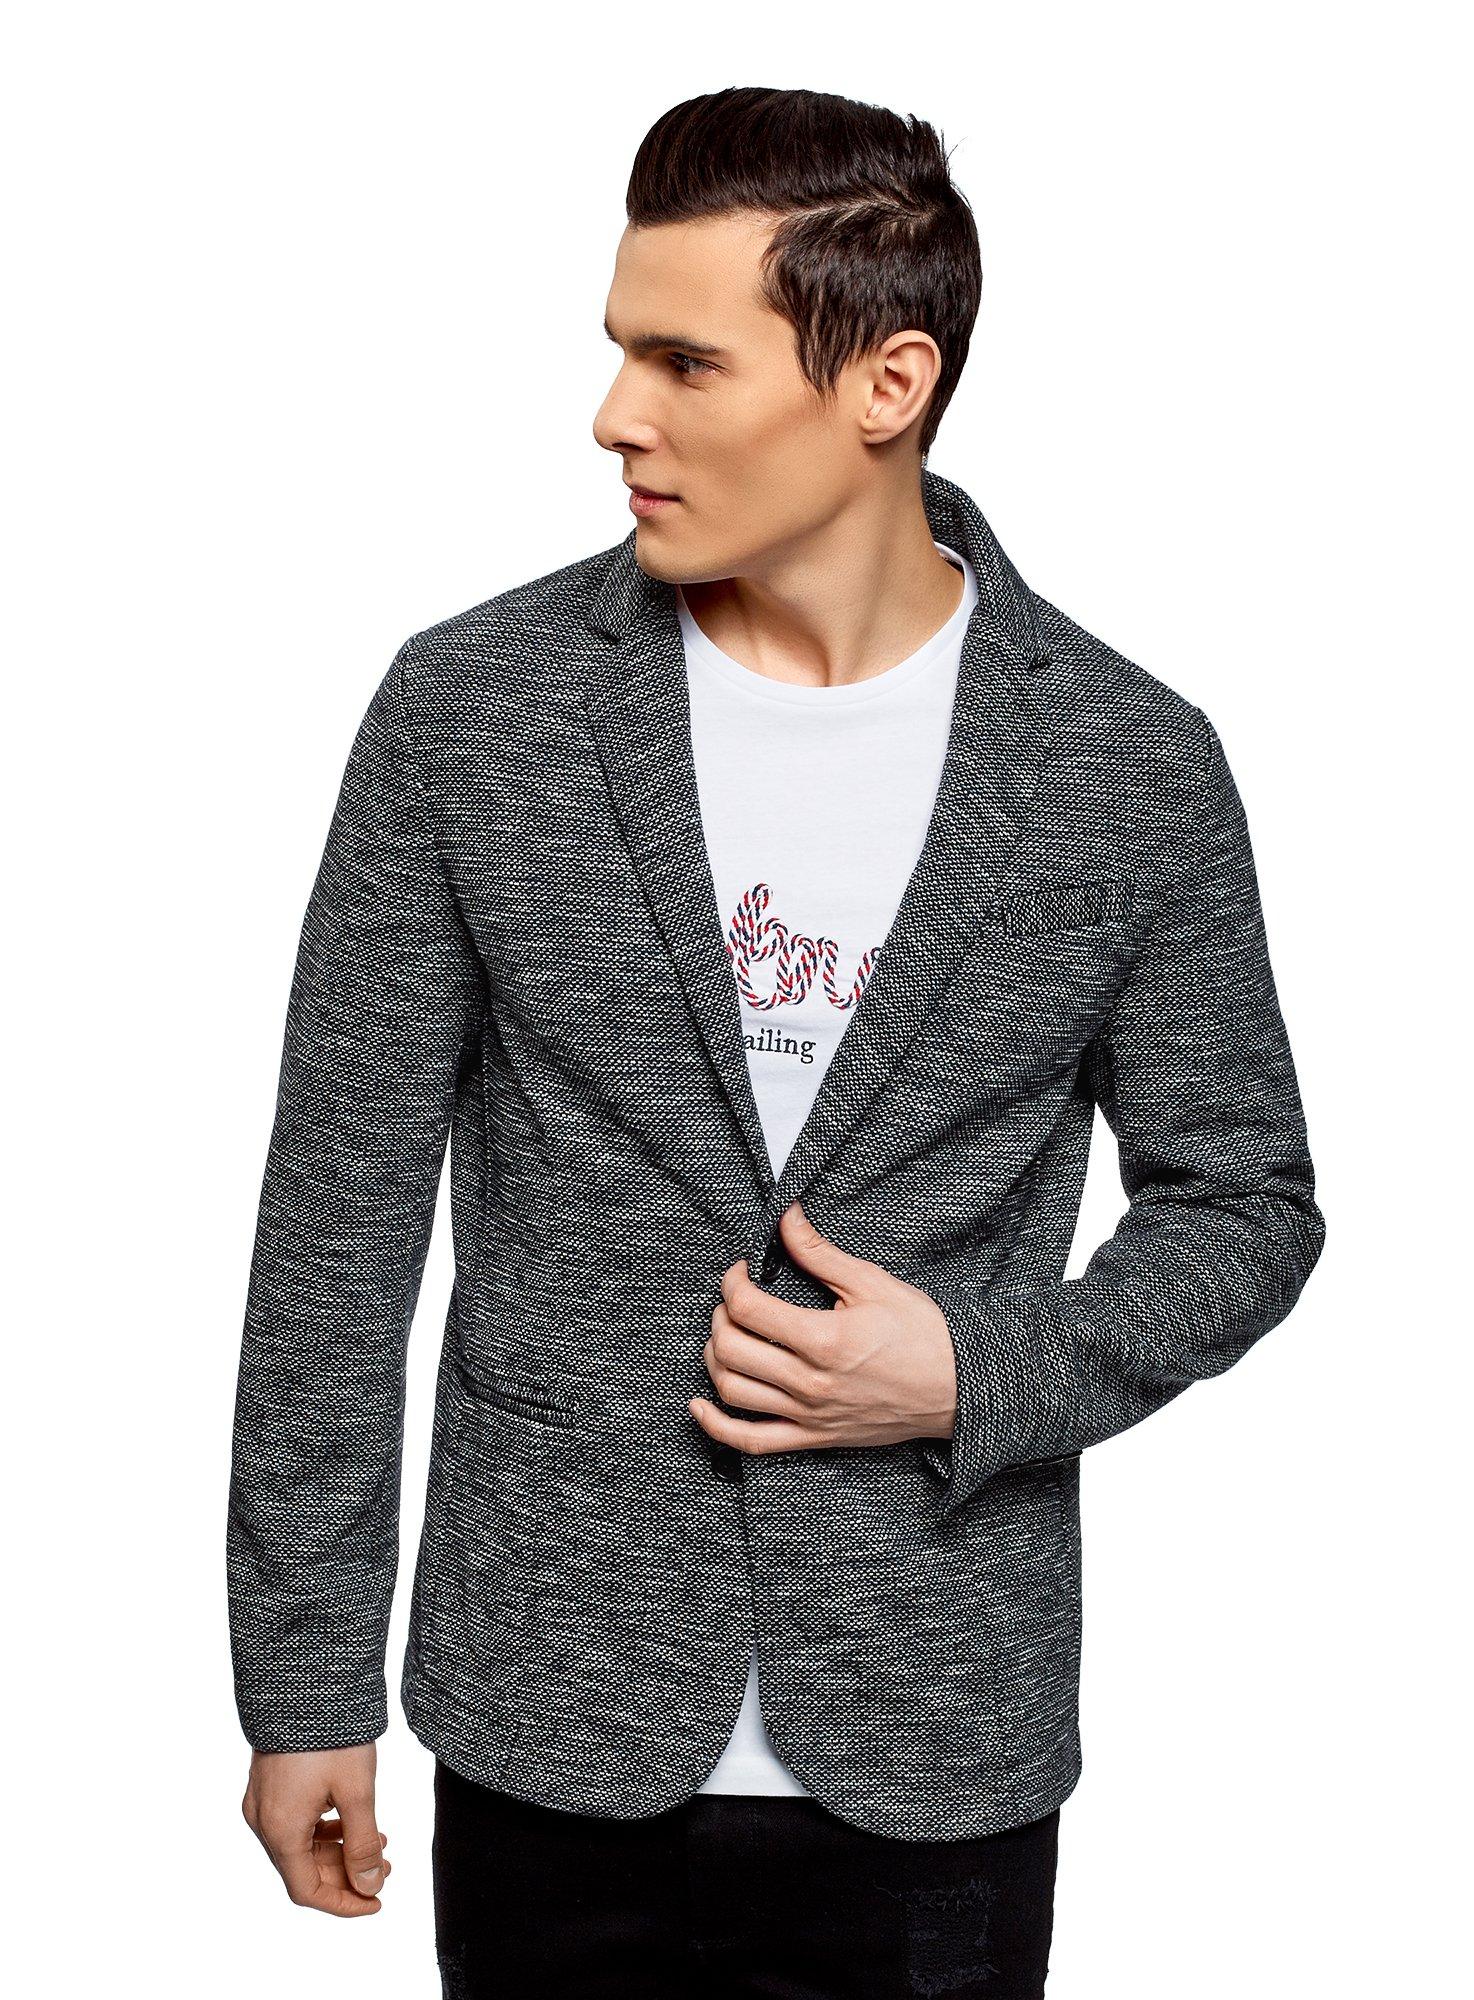 oodji Ultra Men's Buttoned Jersey Cardigan, Grey, US 36-38 / EU 46-48 / S